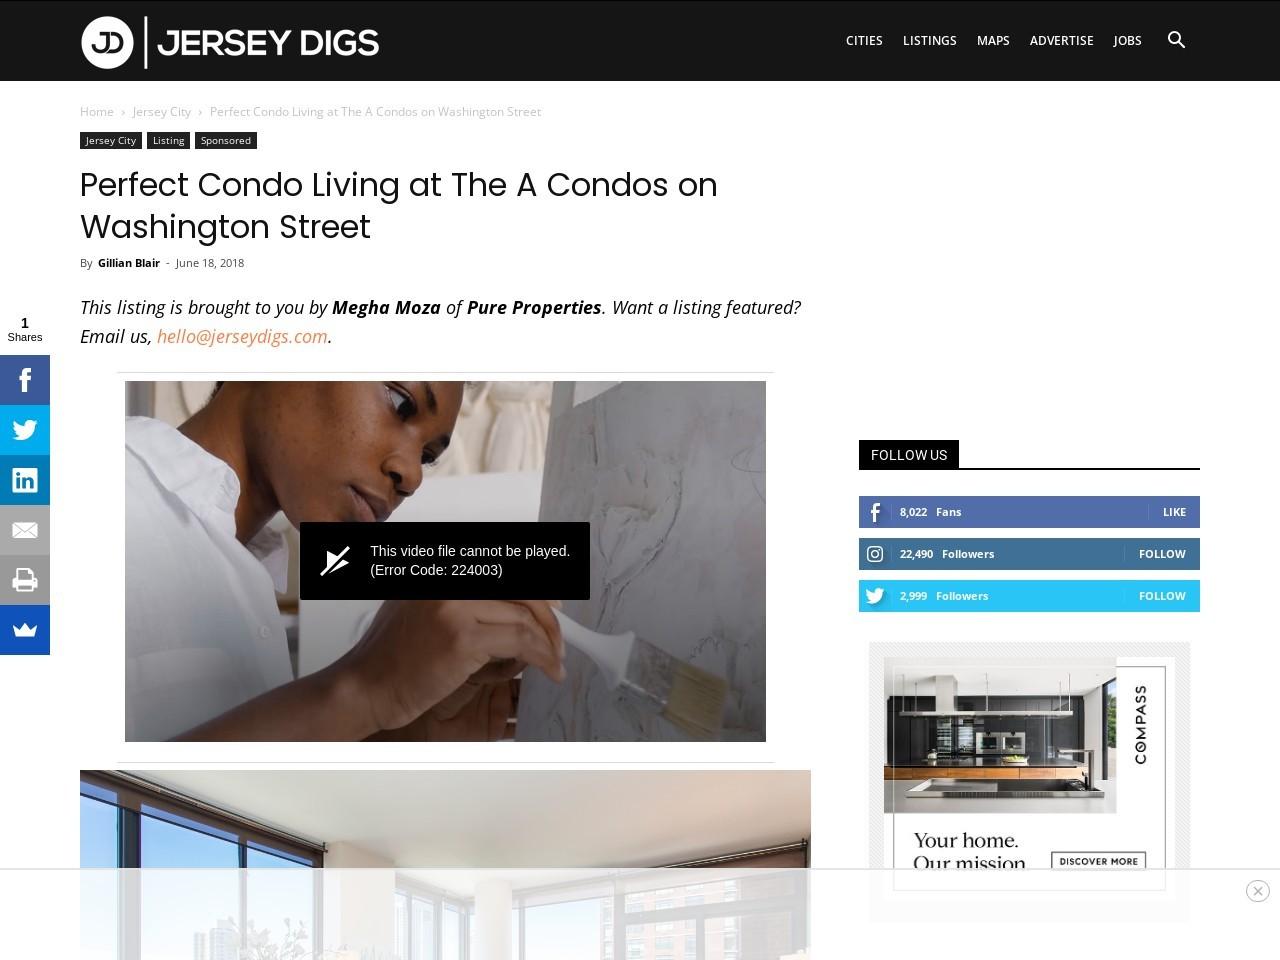 Perfect Condo Living at The A Condos on Washington Street